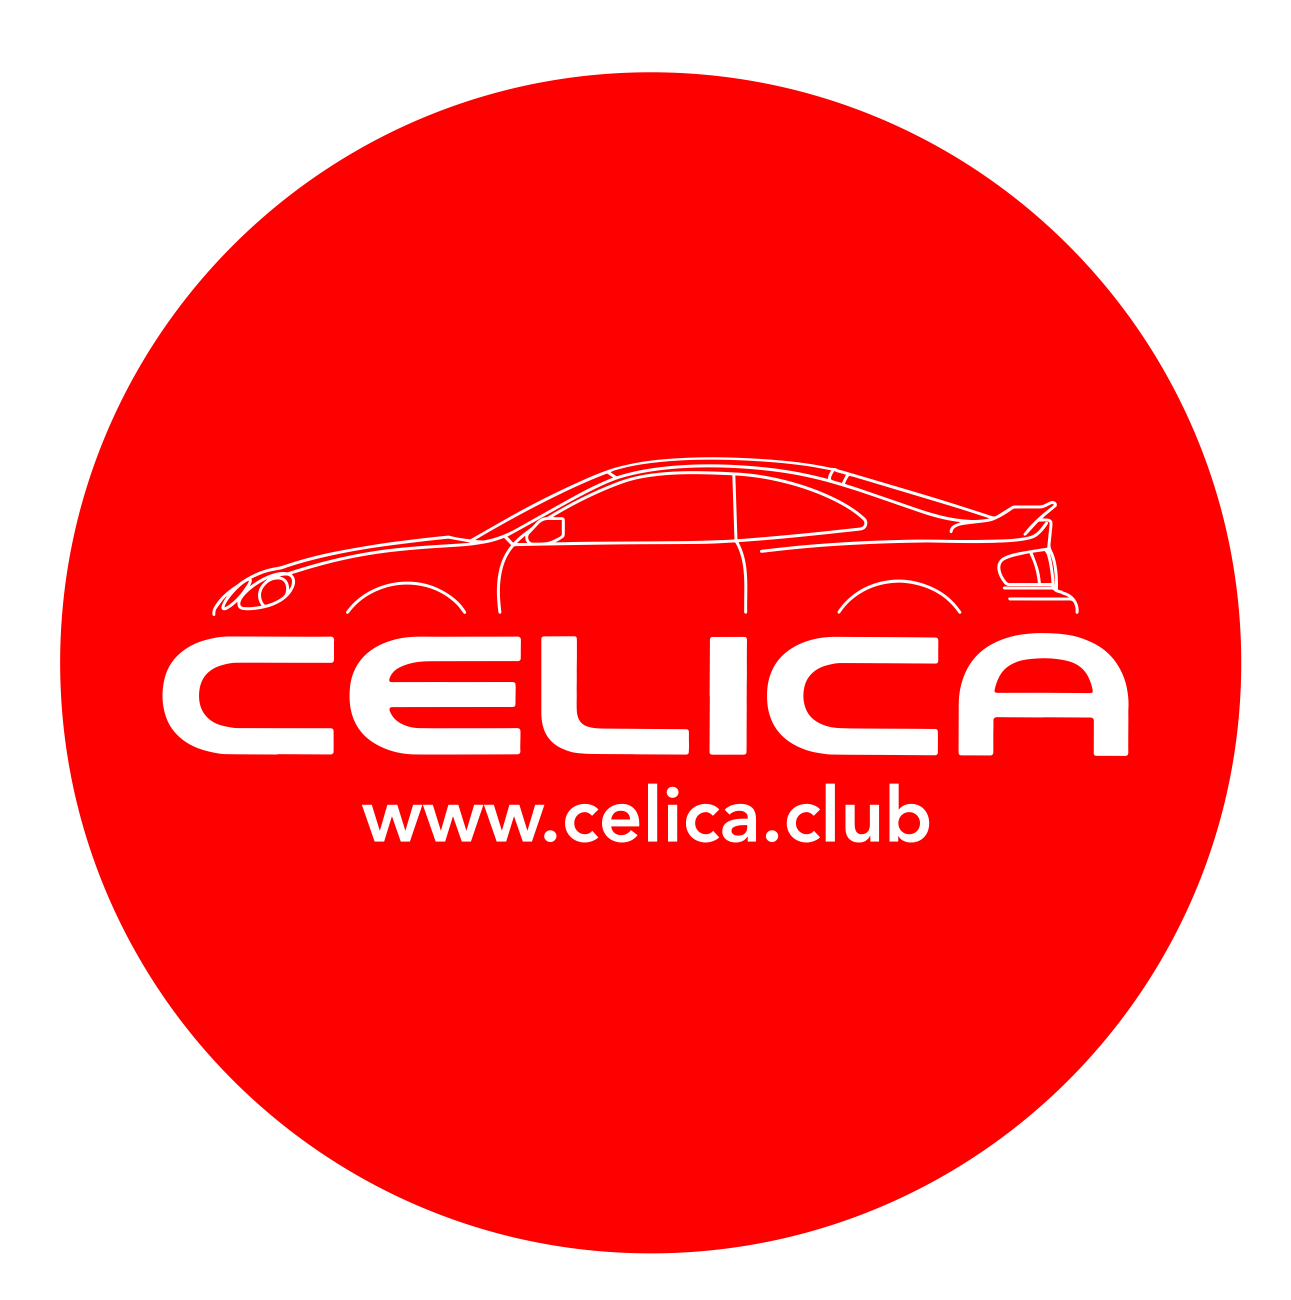 Celica-Club